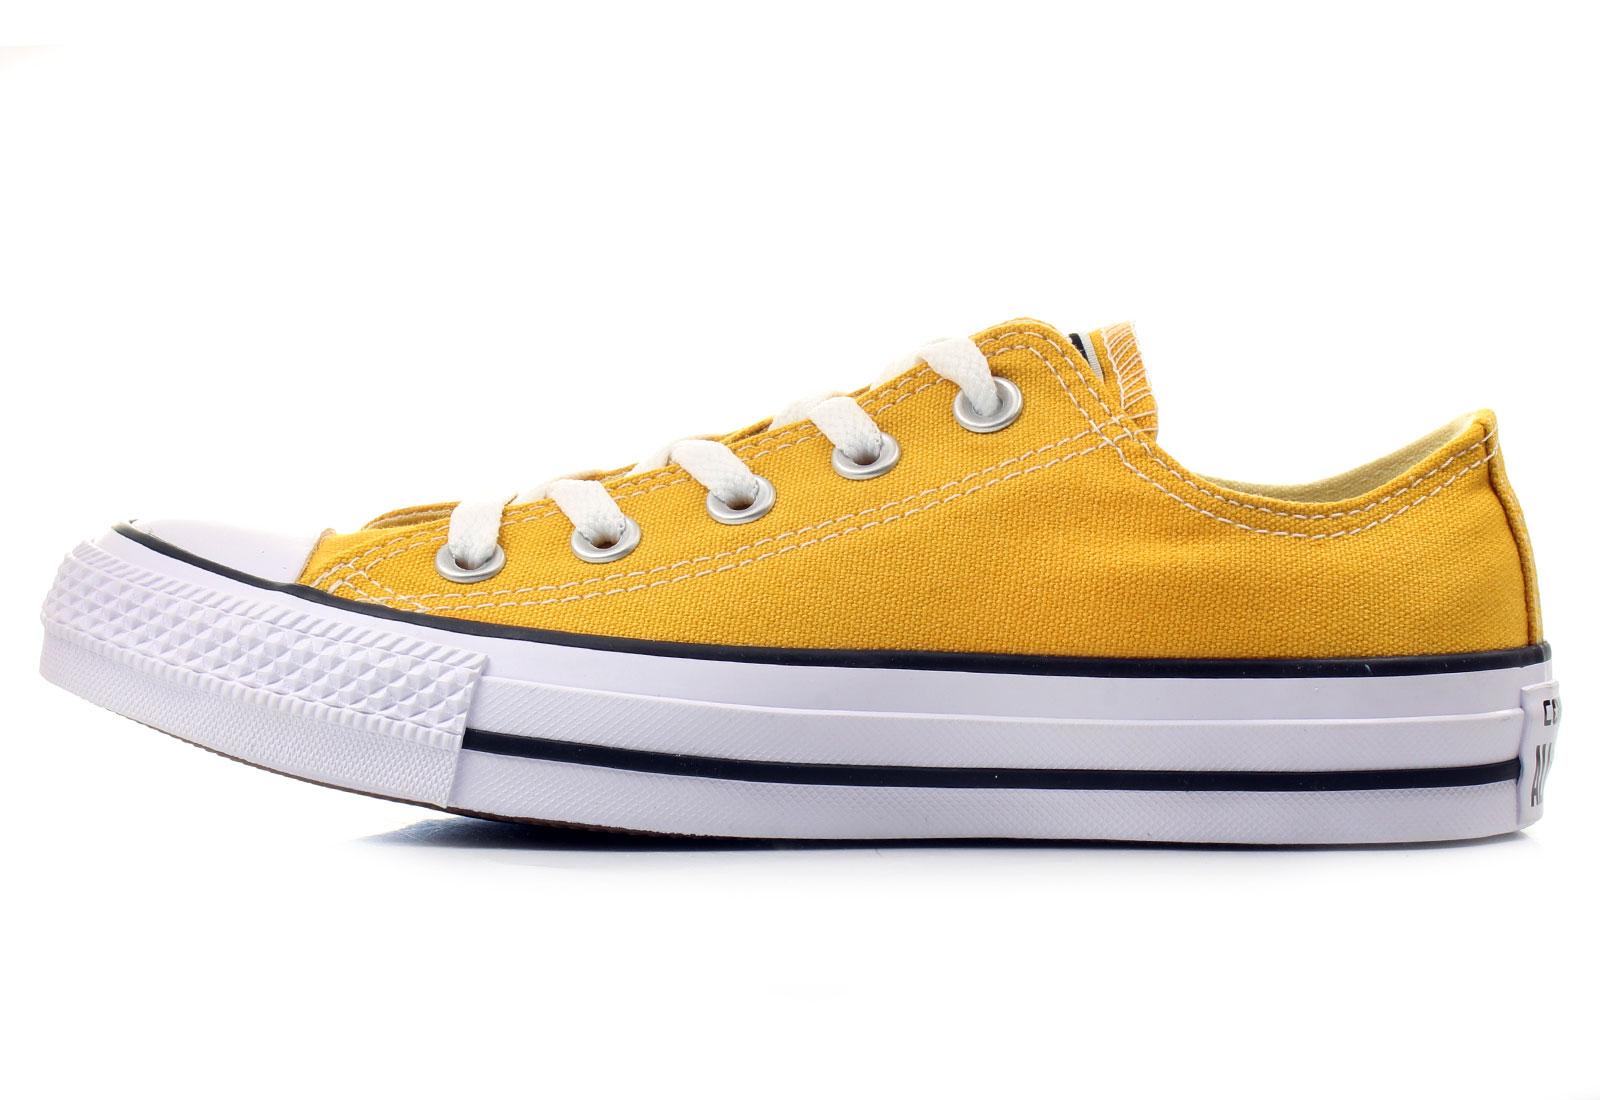 c2ce9515ff56f5 Converse Sneakers - Chuck Taylor All Star Seasonal Ox - 151178C ...